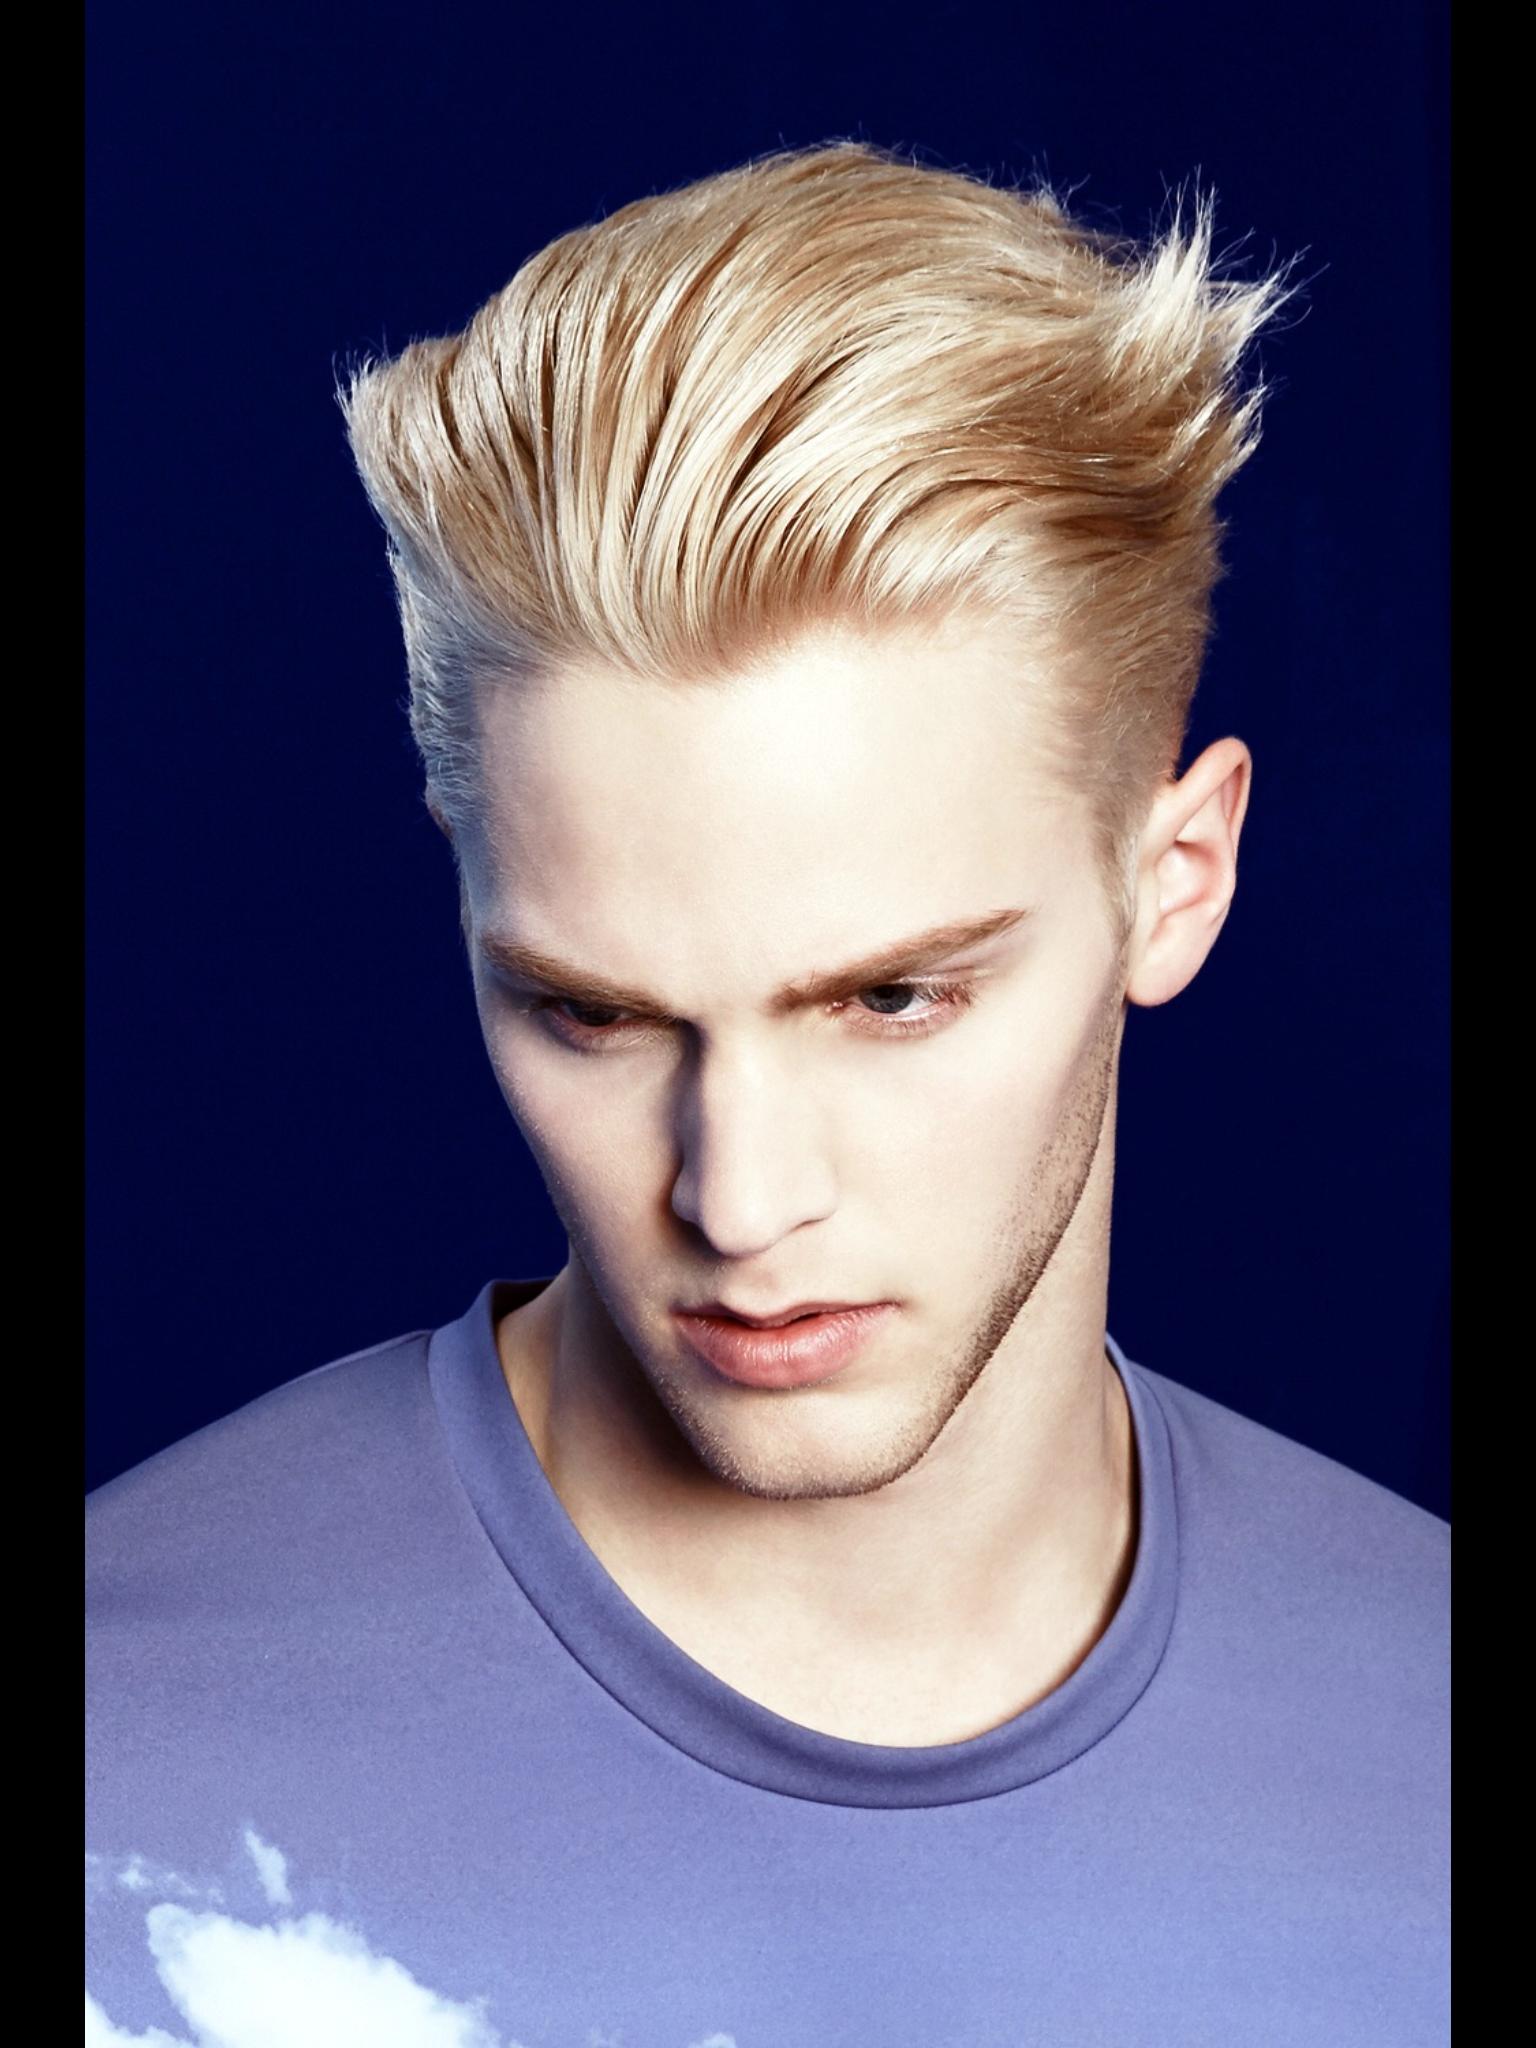 Men s disconnected undercut from schwarzkopf professional - Fashion For Men Men S Style Men S Fashion Men S Wear Mode Homme